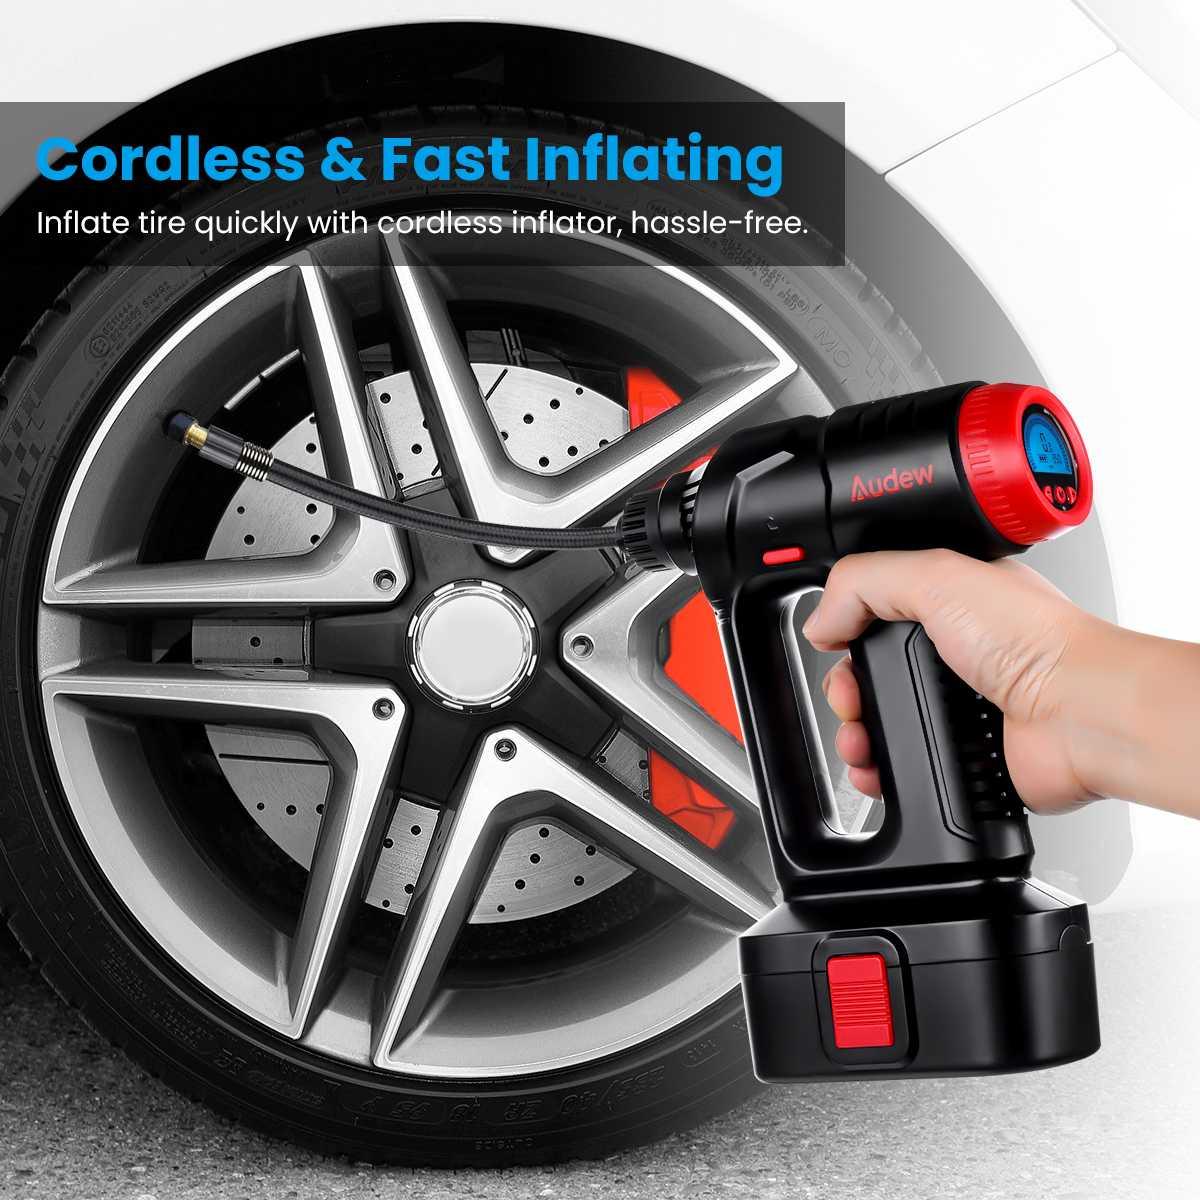 Digital Display Pressure Preset Air Compressor Car Tyre Tire Inflator JL Camping & Outdoor